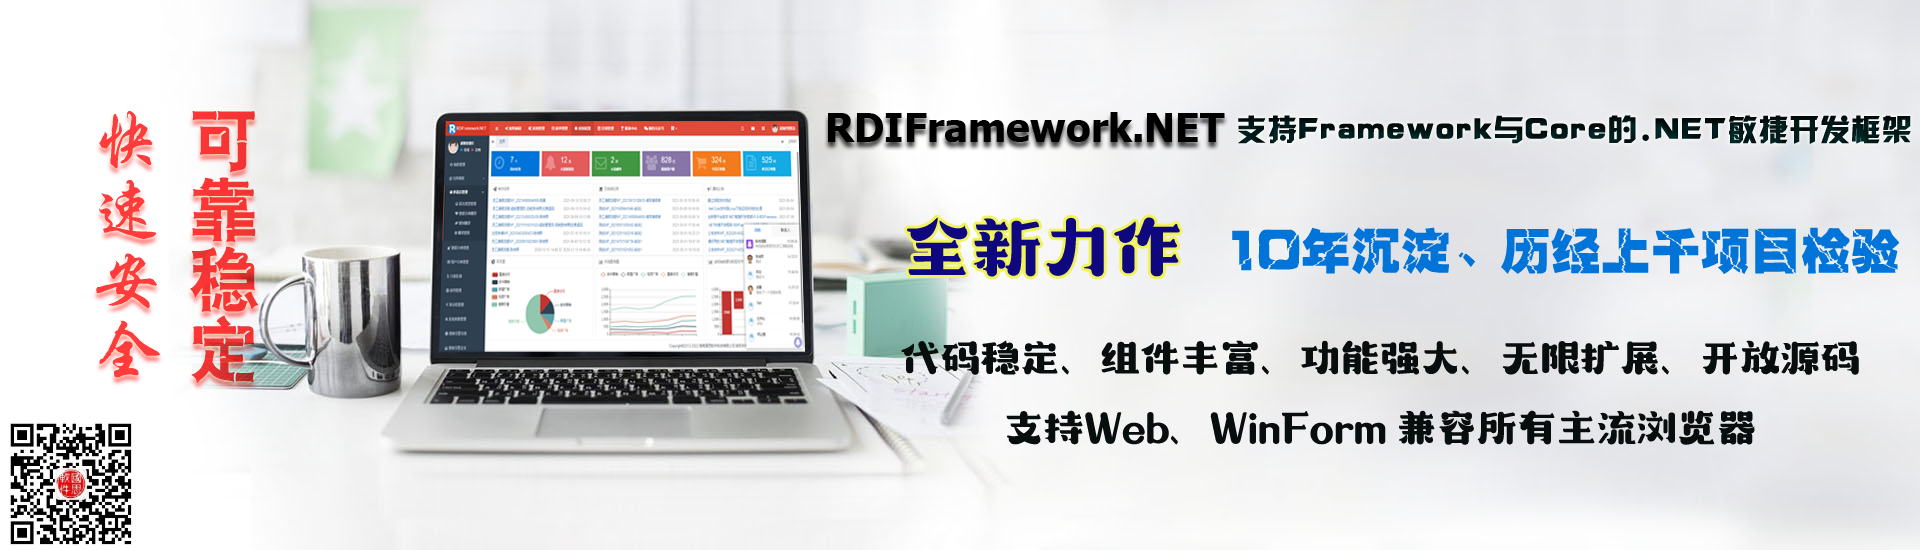 .NET敏捷开发框架-RDIFramework.NET V5.1发布